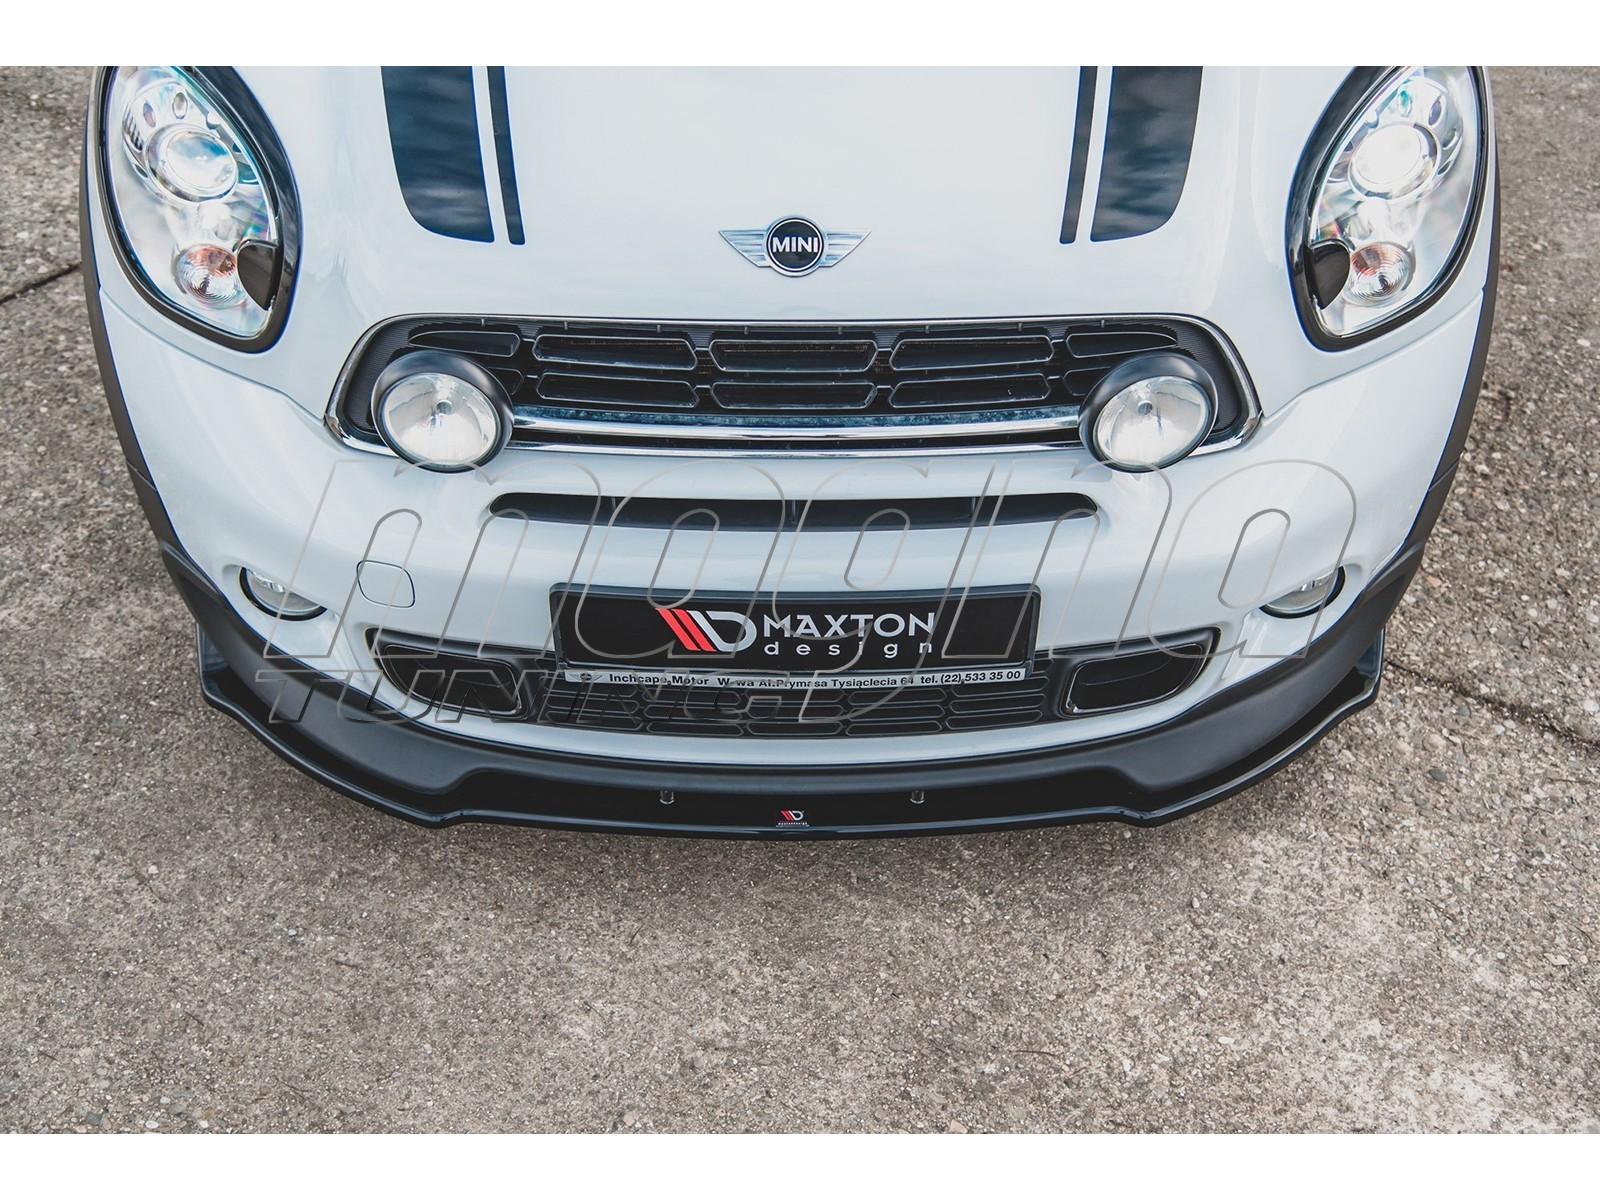 Mini Countryman 1 R60 MX Front Bumper Extension